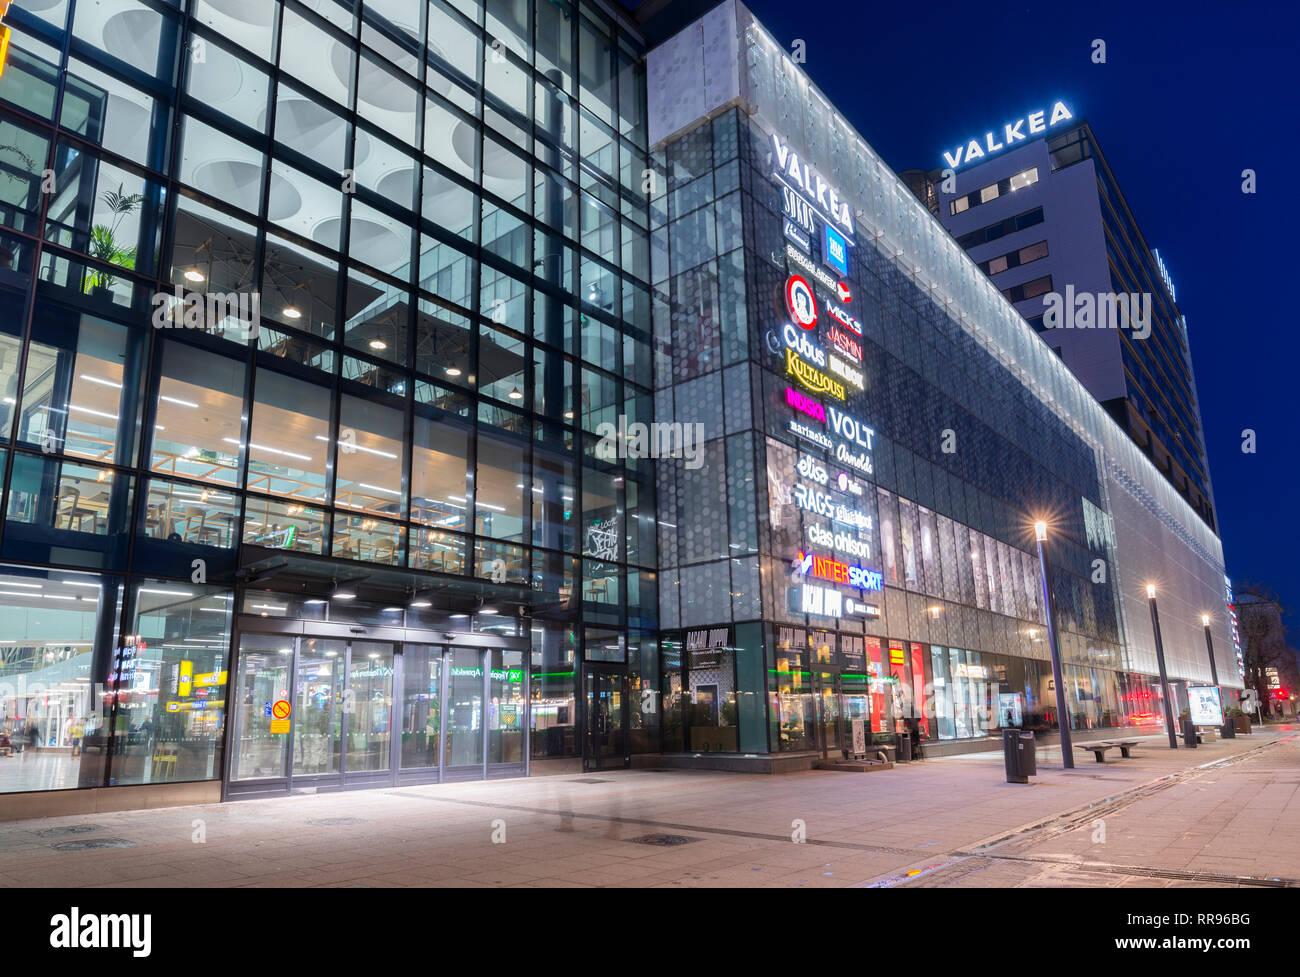 Valkea Shopping Centre in Oulu, Finland Stock Photo